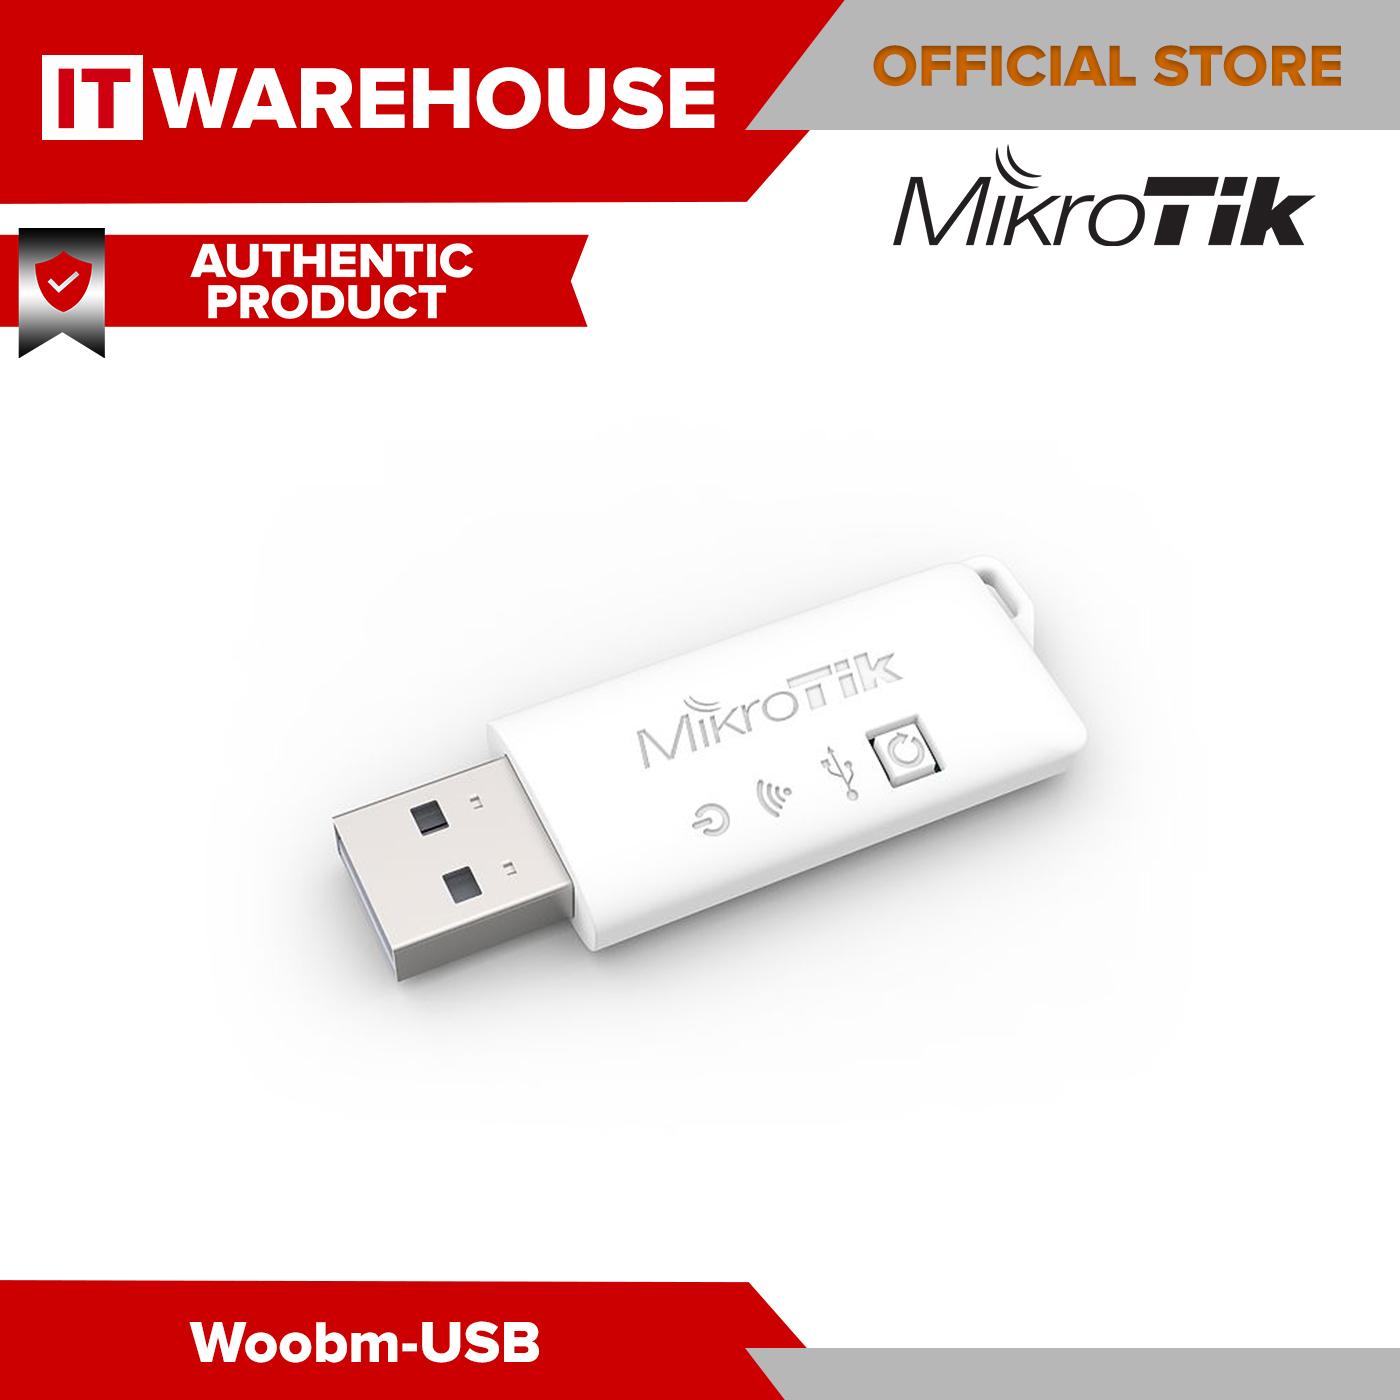 Woobm-USB Mikrotik Wireless Out of Band Management USB Stick 2.4 GHz Standard